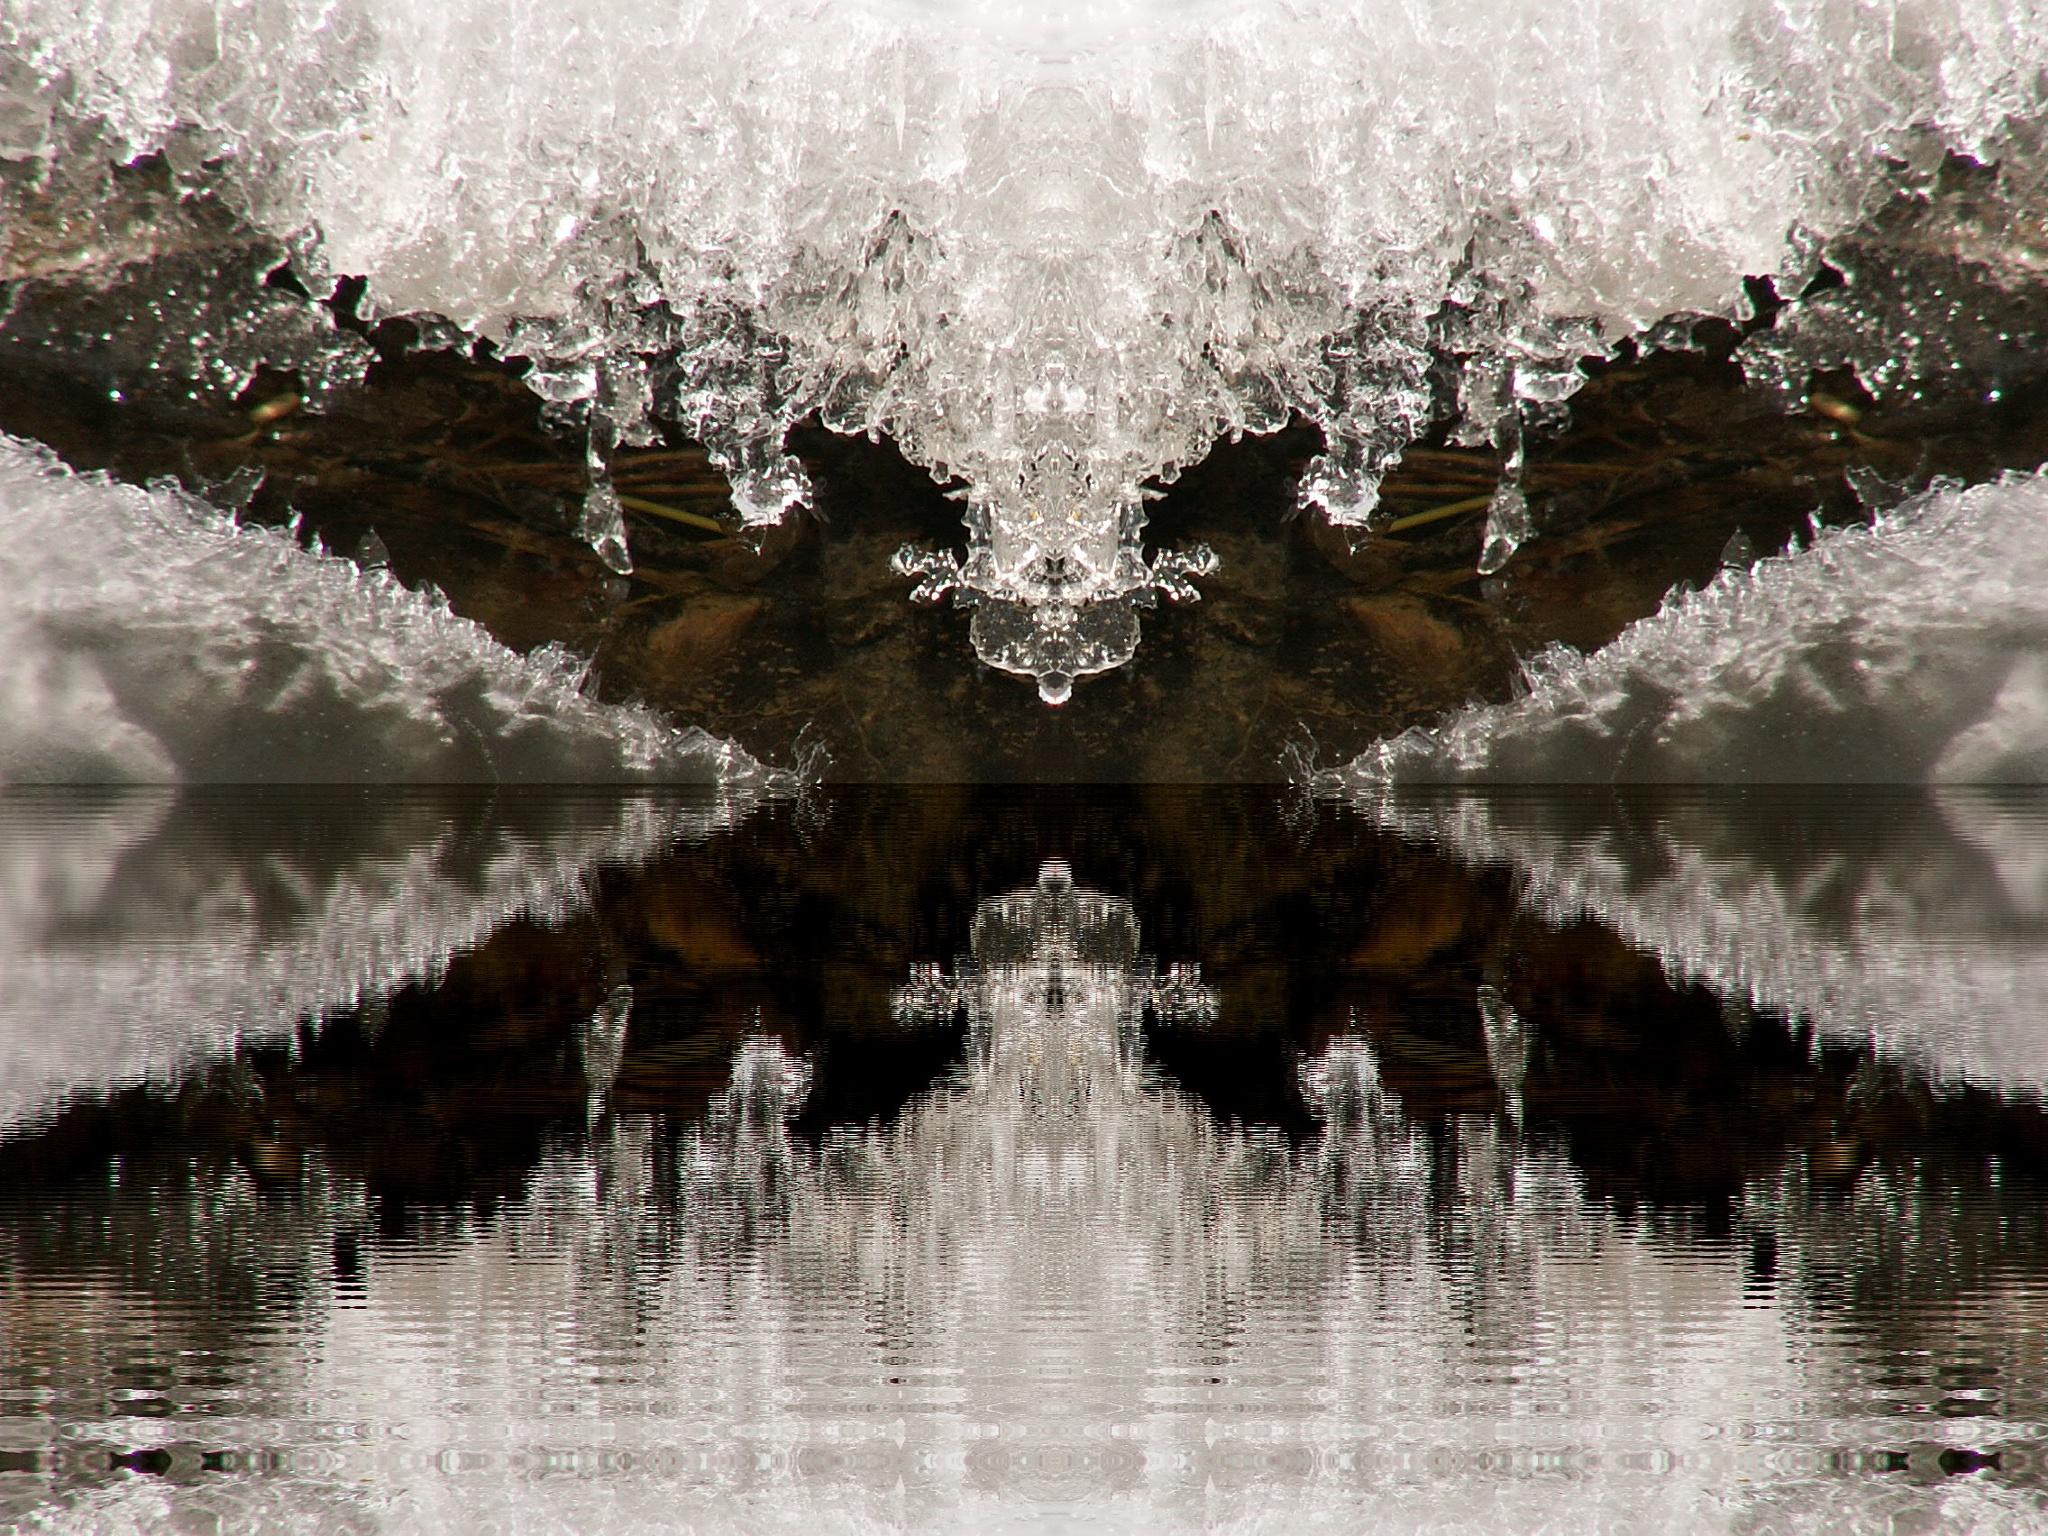 Untitled by Renata Baudyte